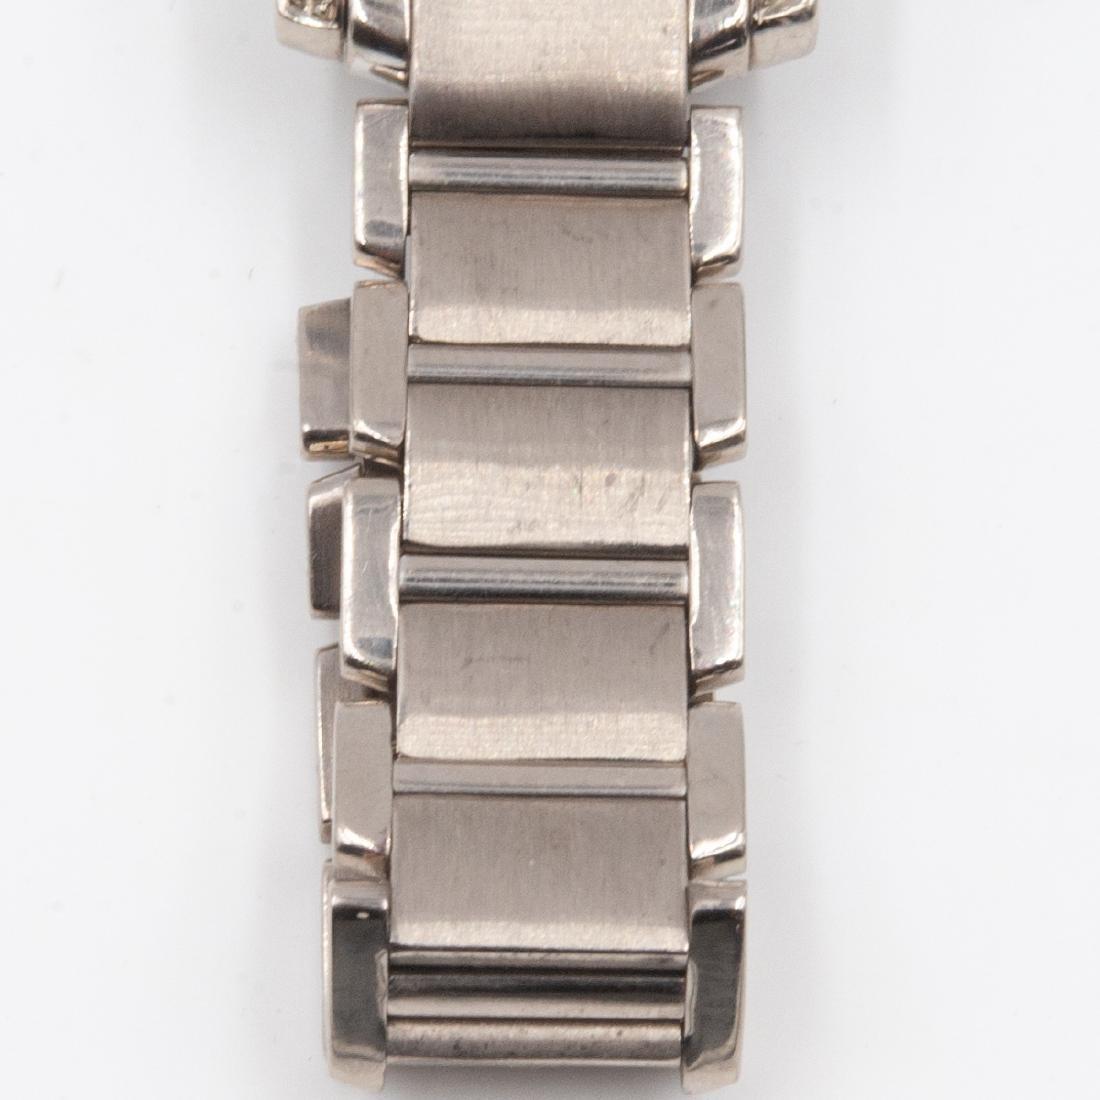 18k Gold Cartier Ladies Watch - 5